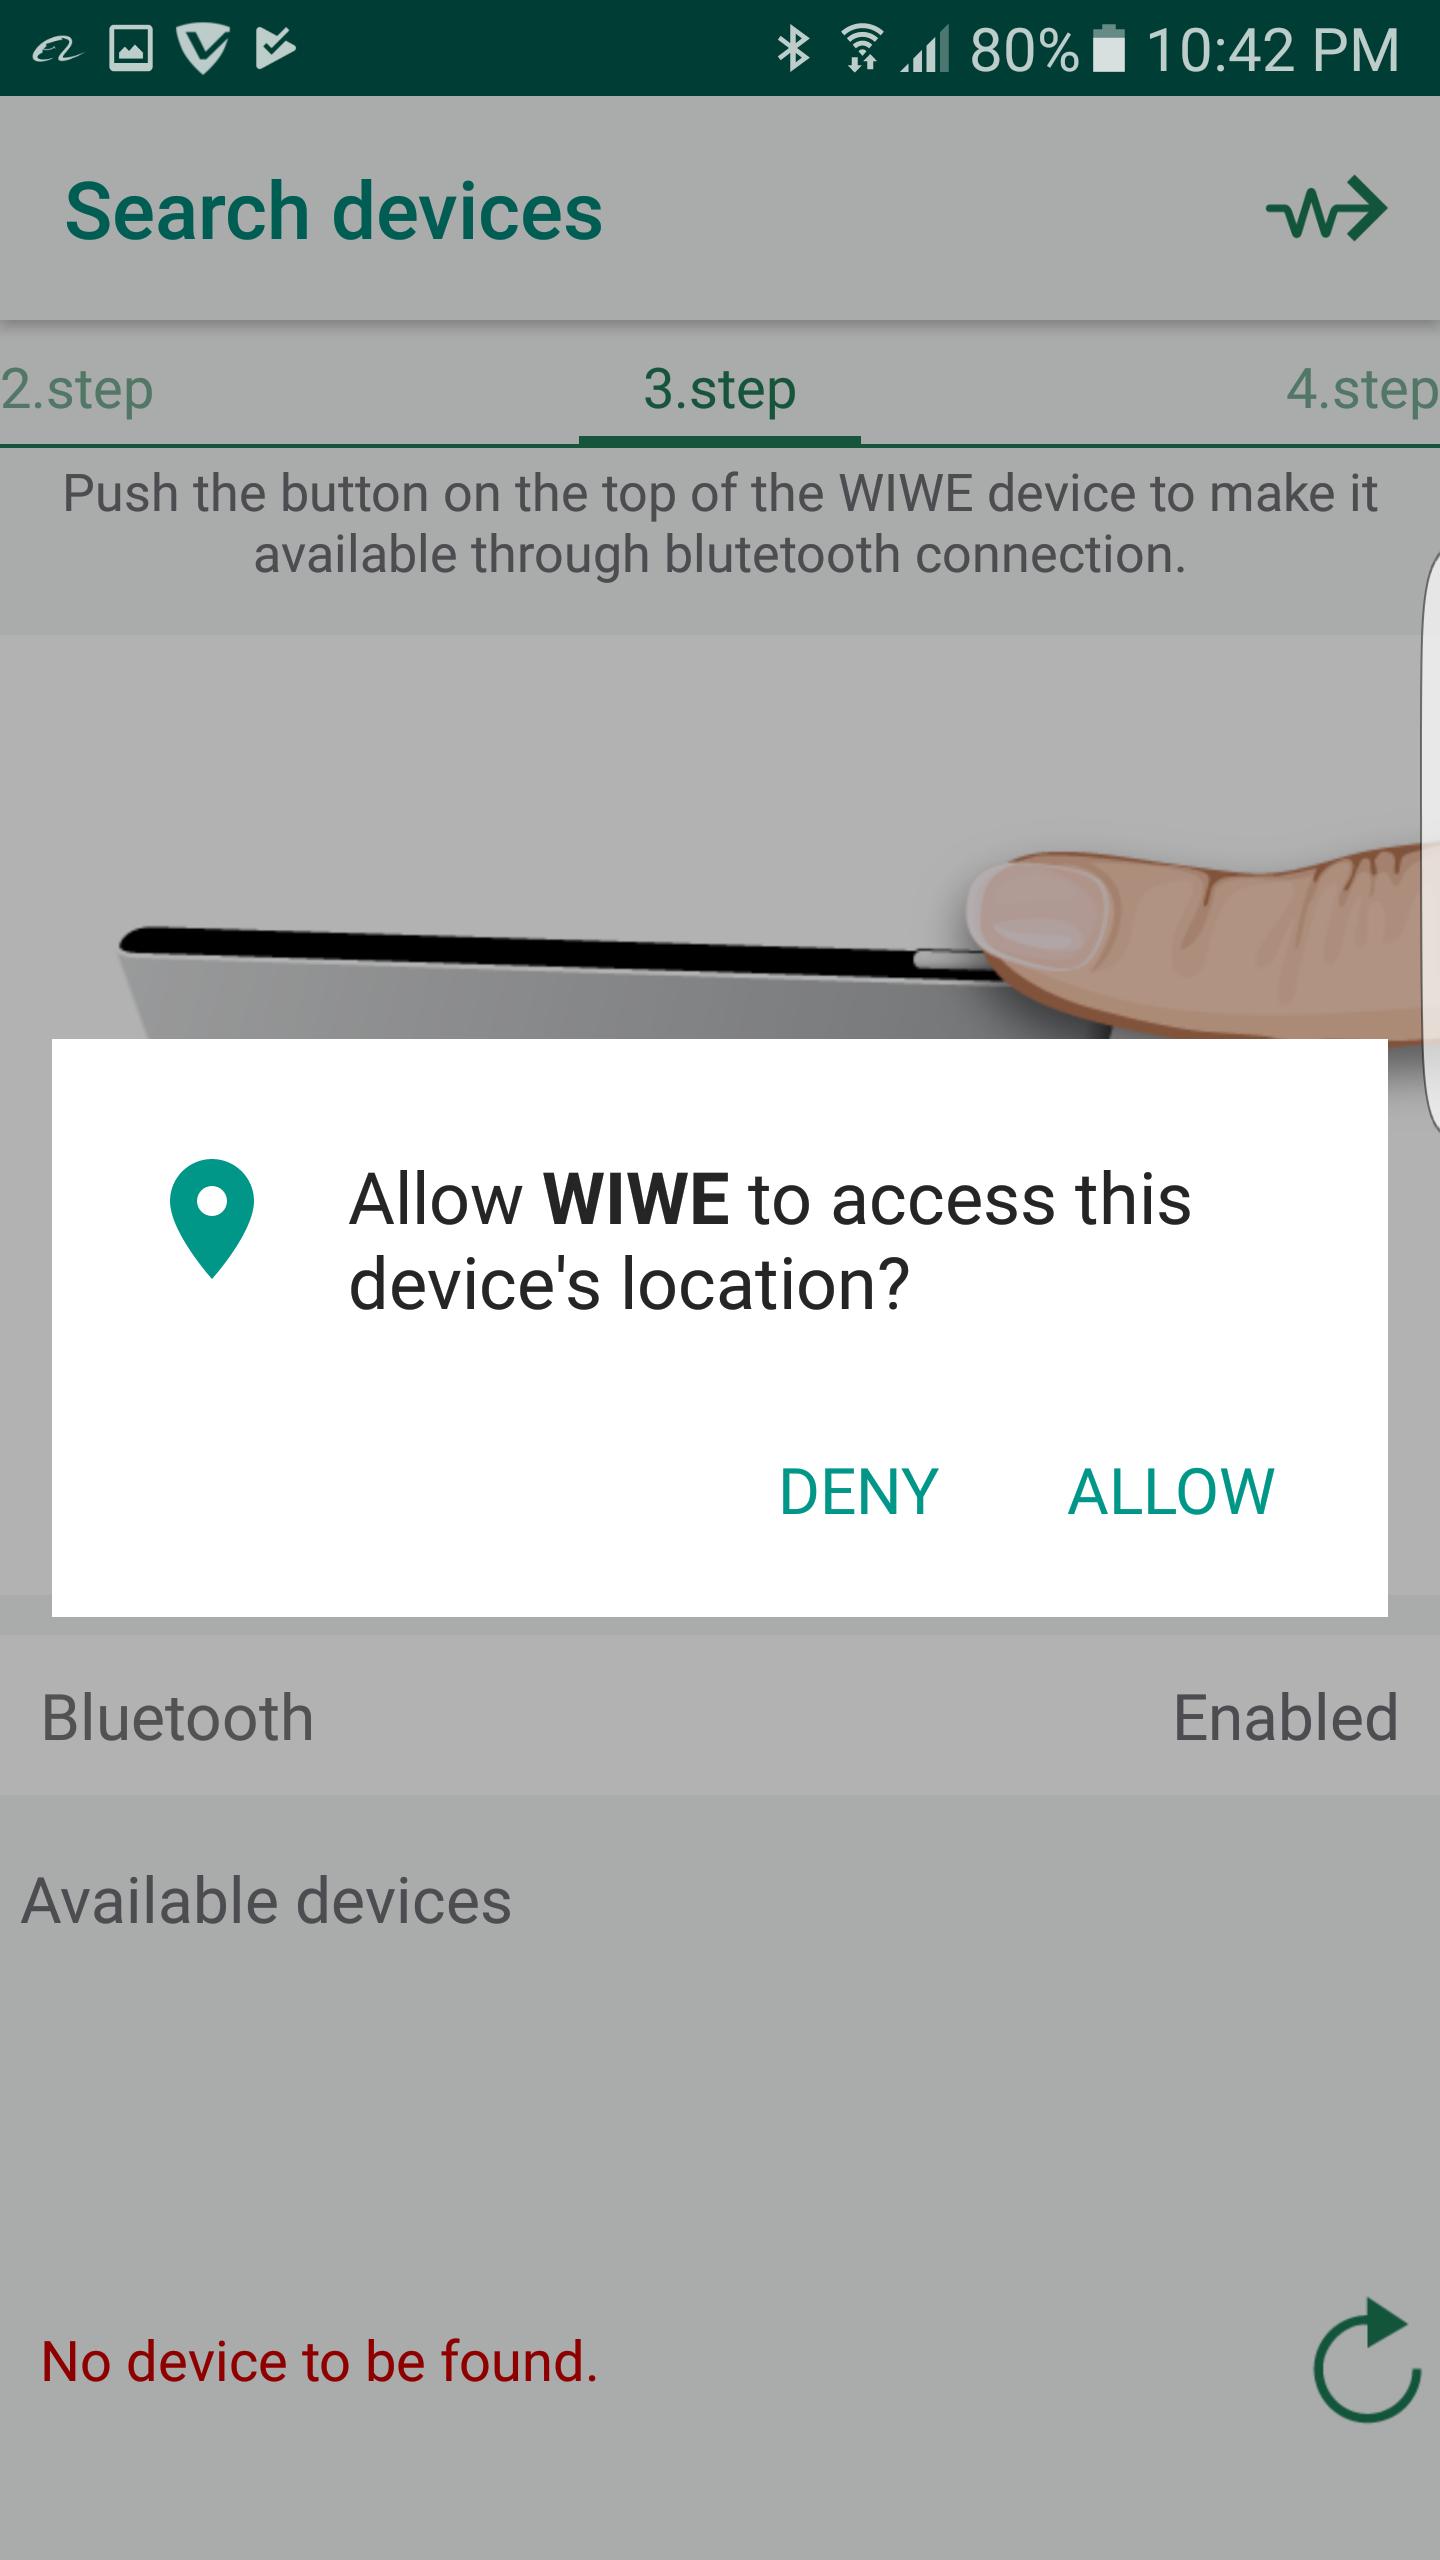 Allow WIWE Access